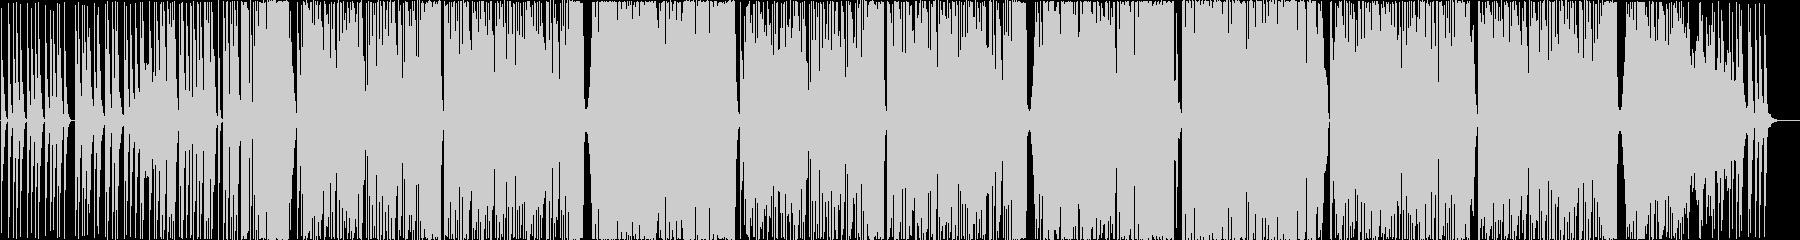 EDM系マシュメロぽいメロディクな曲-2の未再生の波形